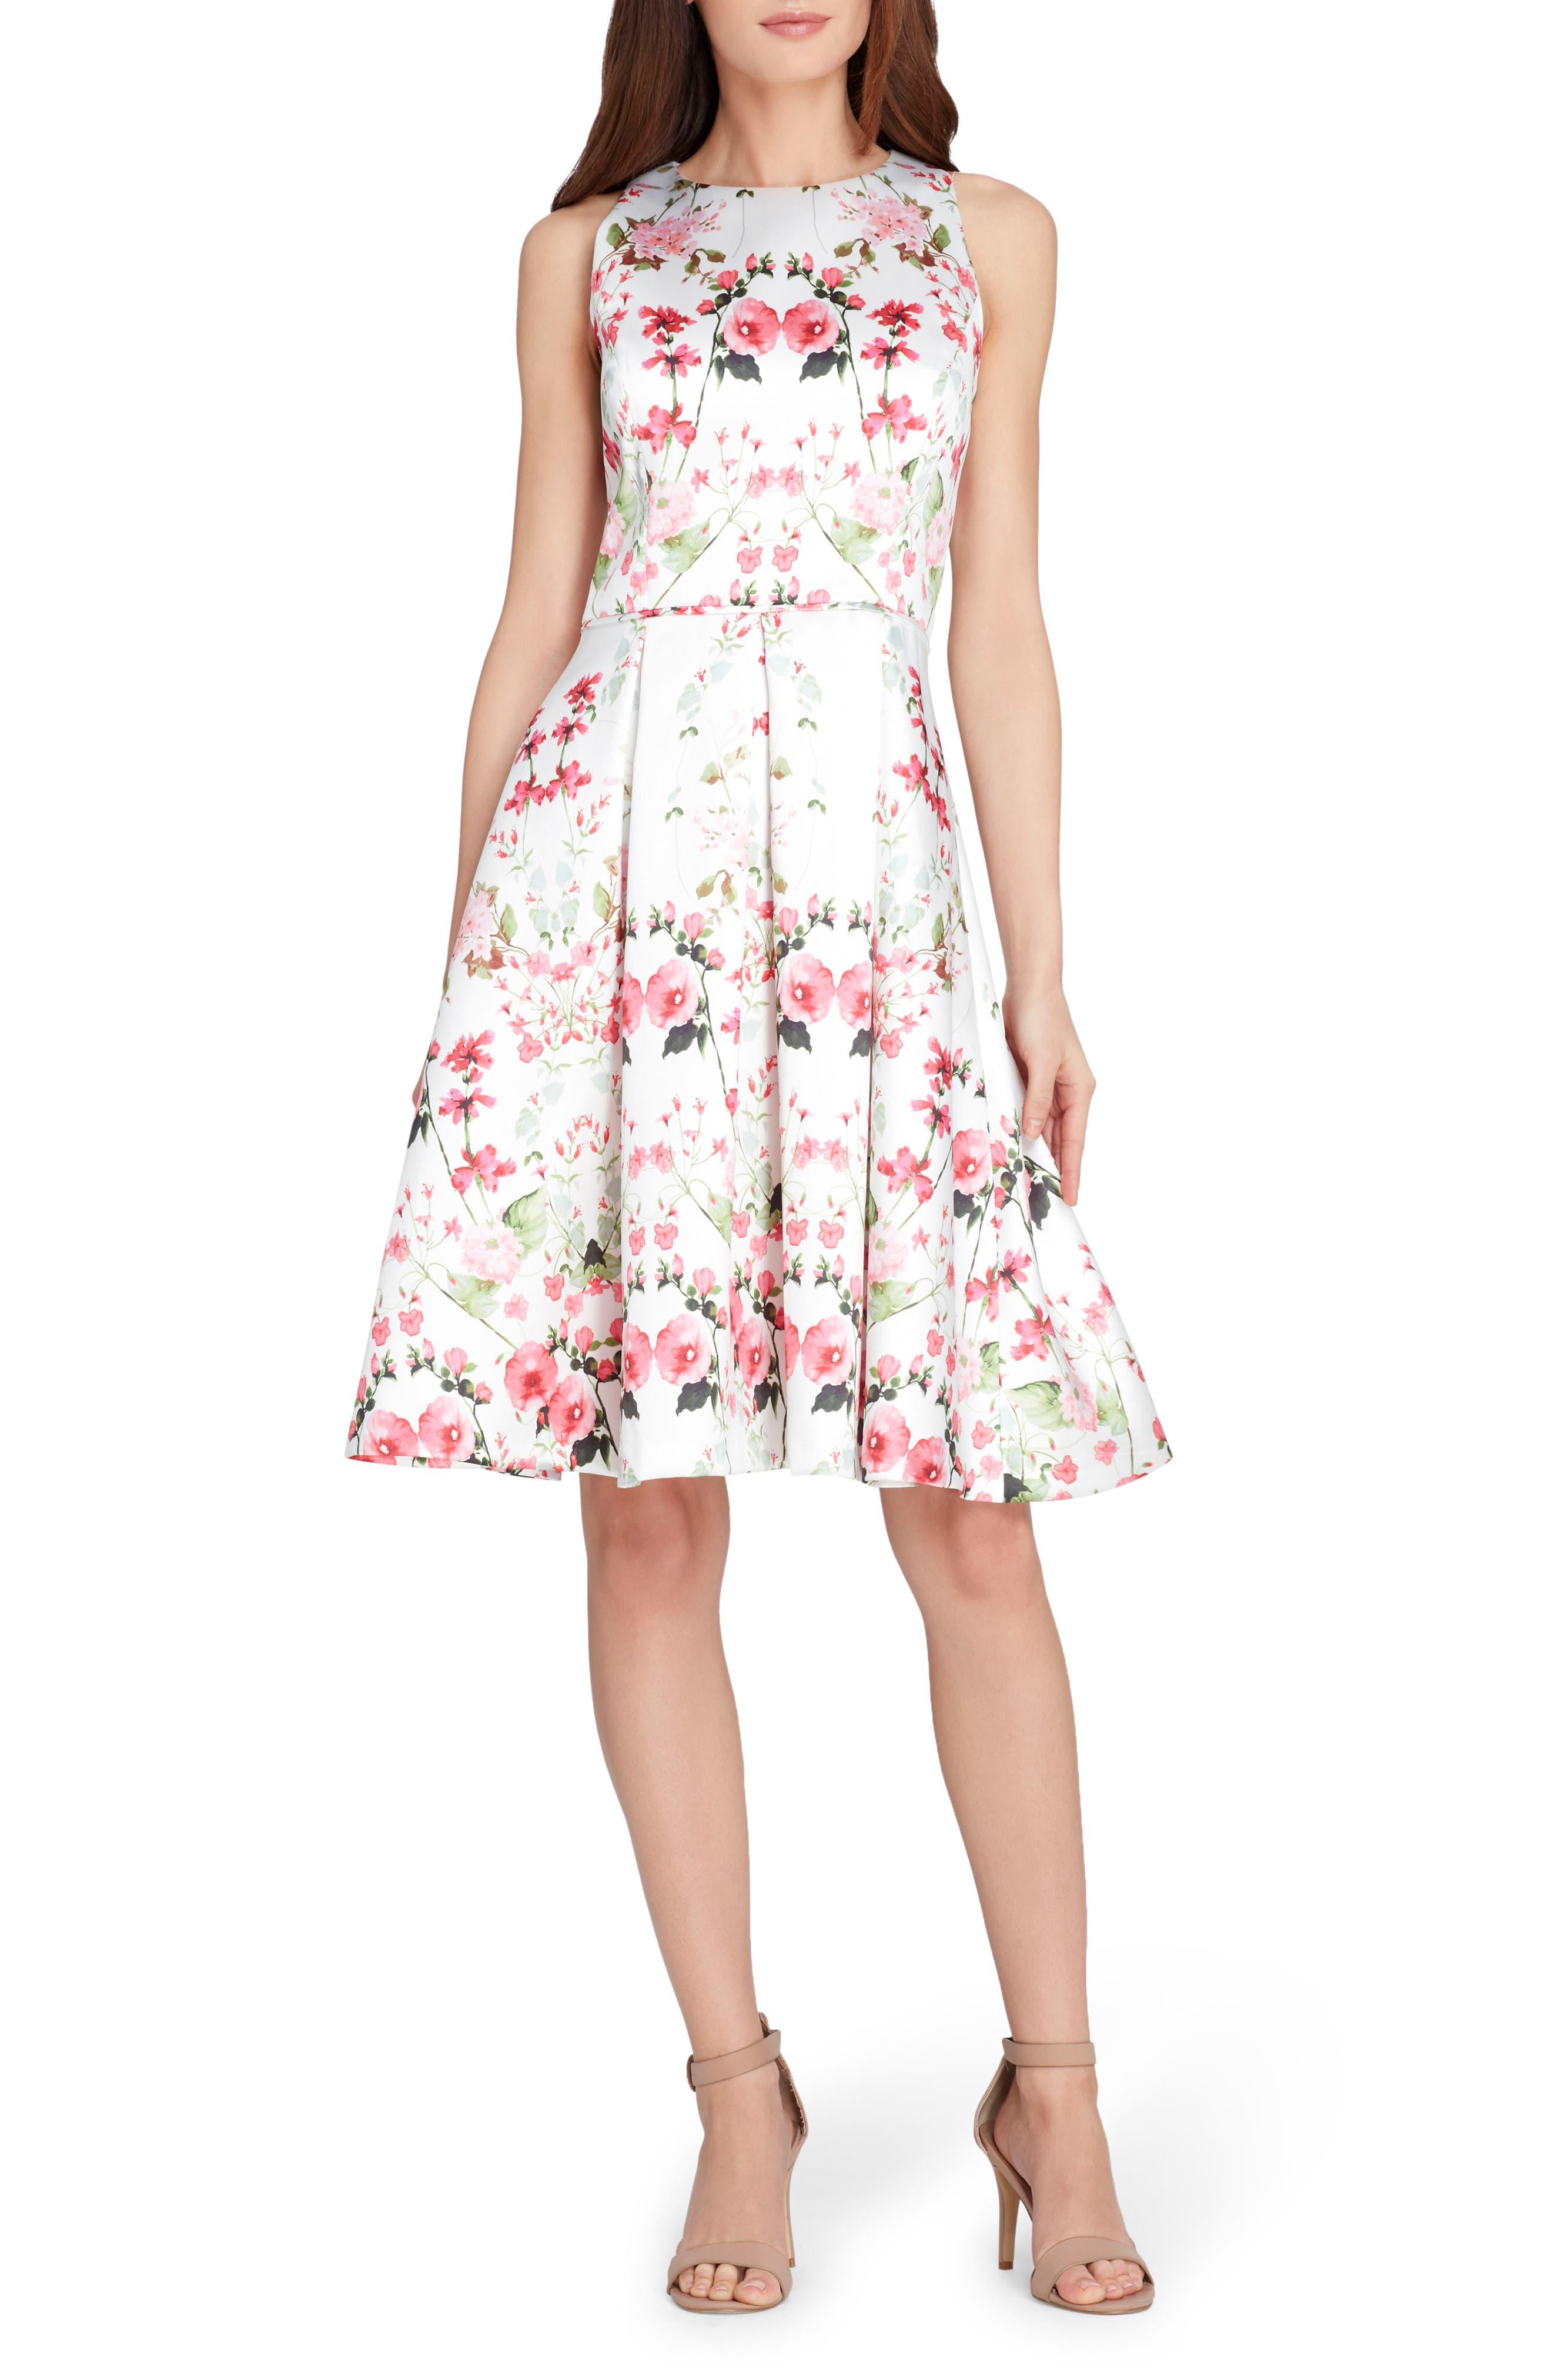 Micado Floral Print Fit & Flare Dress,                             Main thumbnail 1, color,                             907